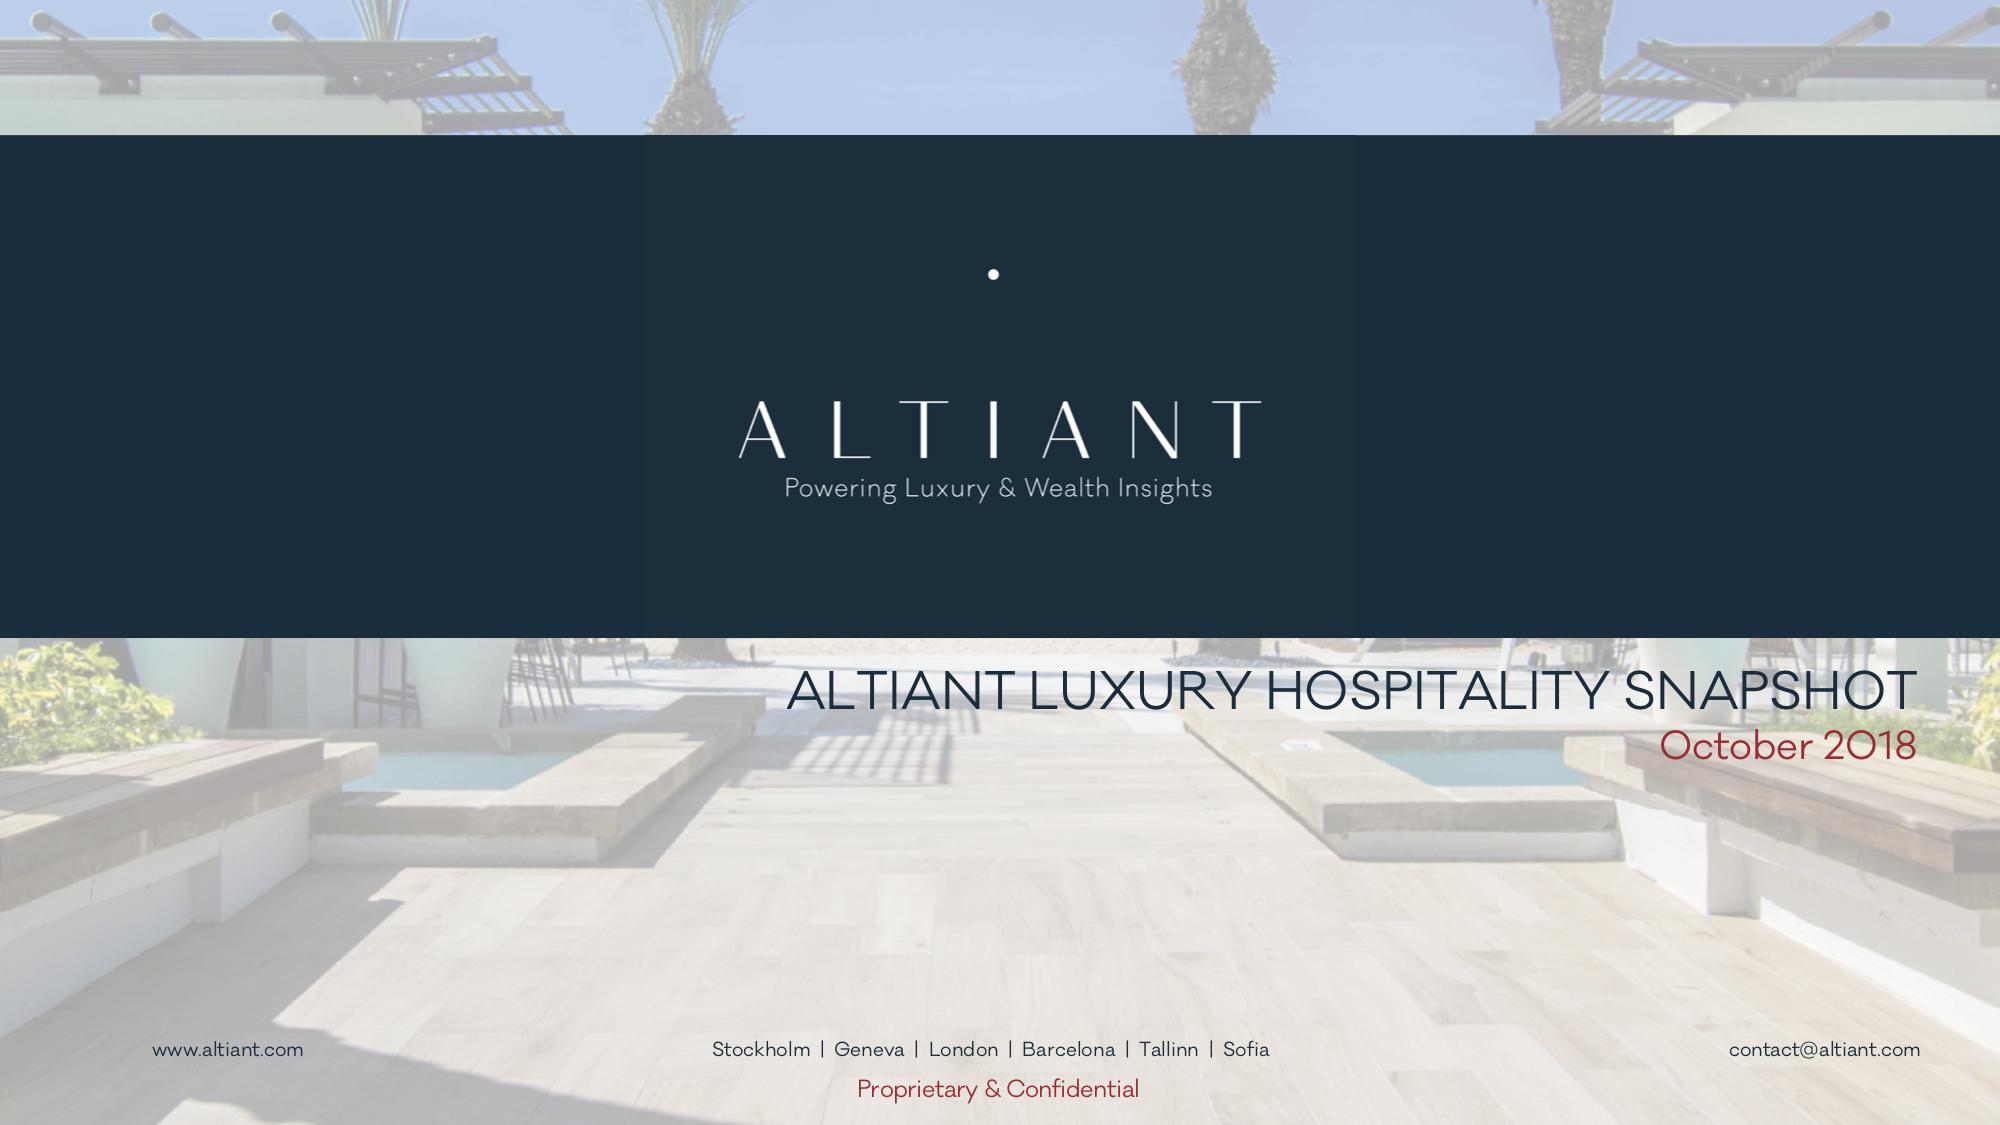 Luxury Hospitality Snapshot p1.png